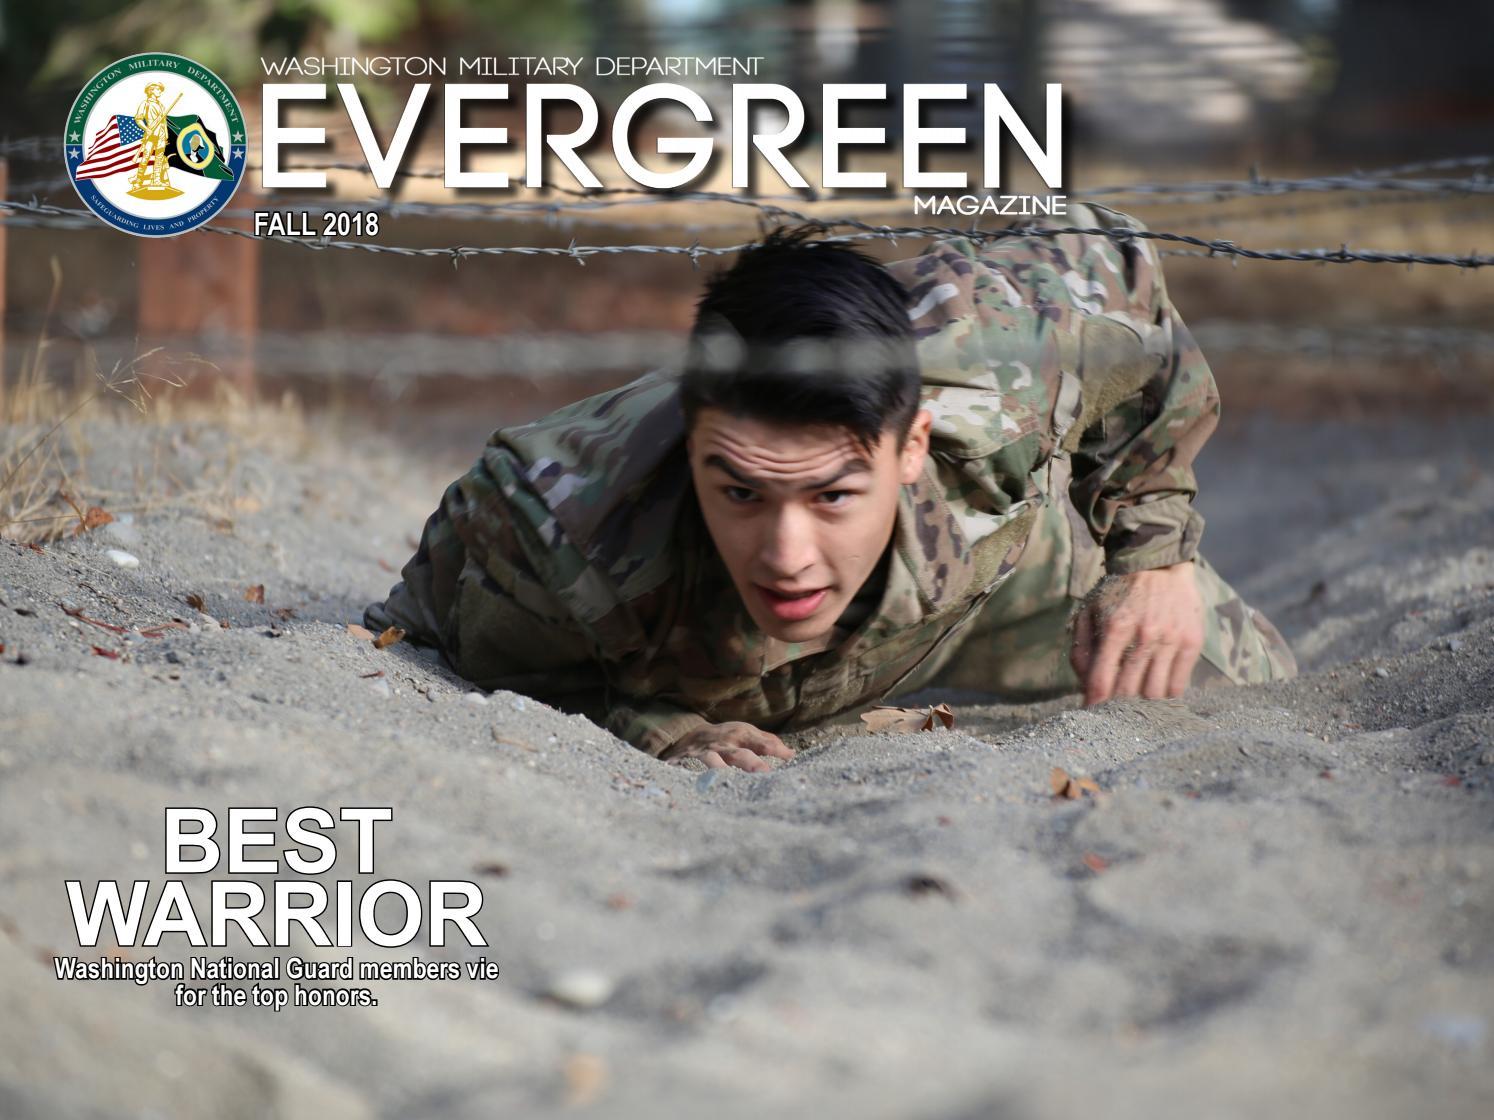 Evergreen Magazine Fall edition by Washington Military